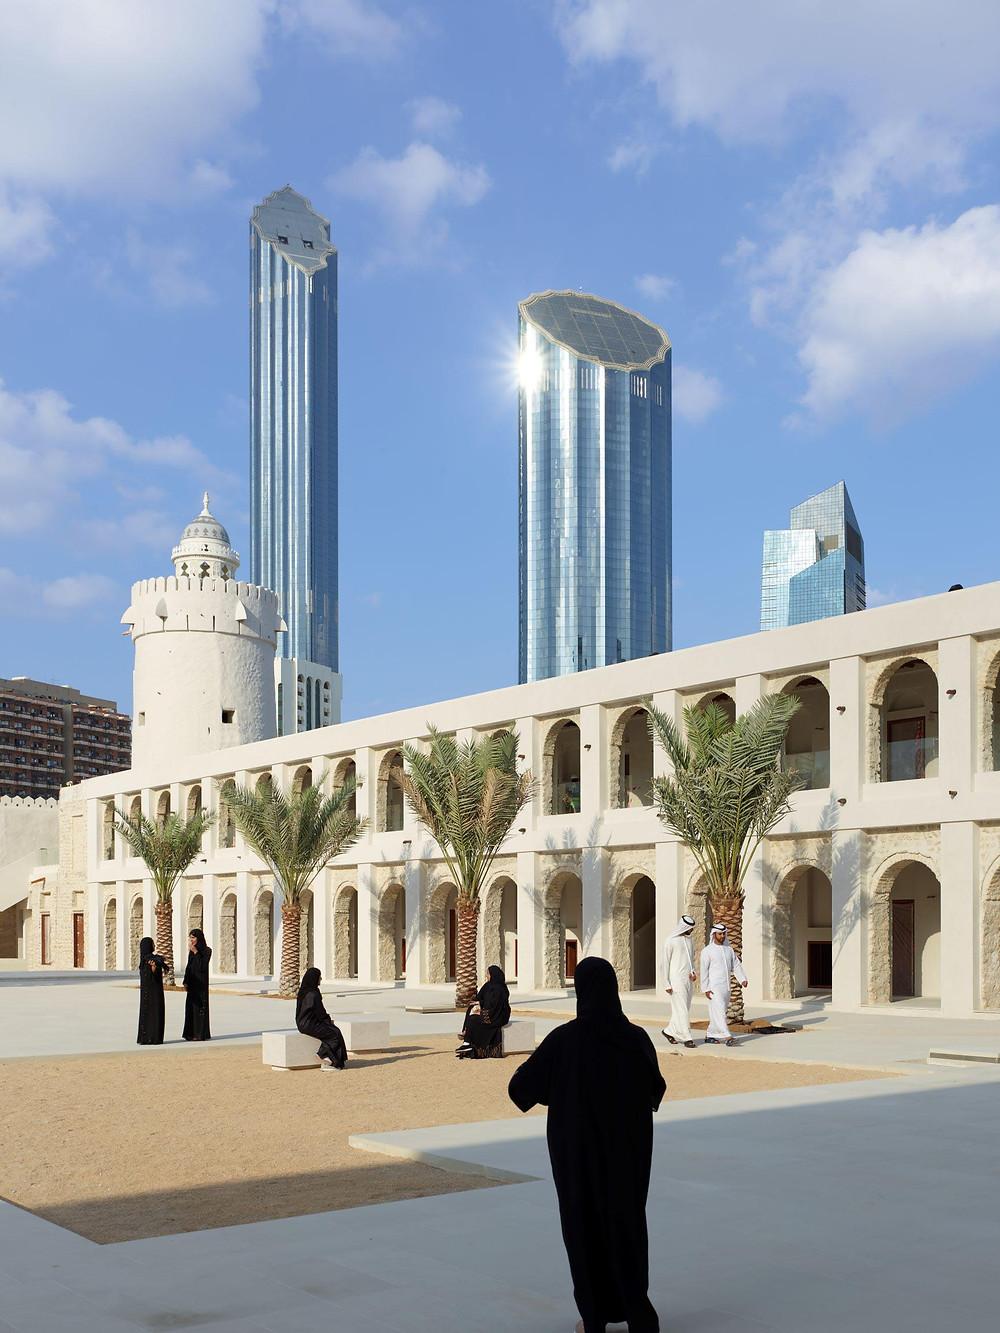 Palace Courtyard Qasr Al Hosn